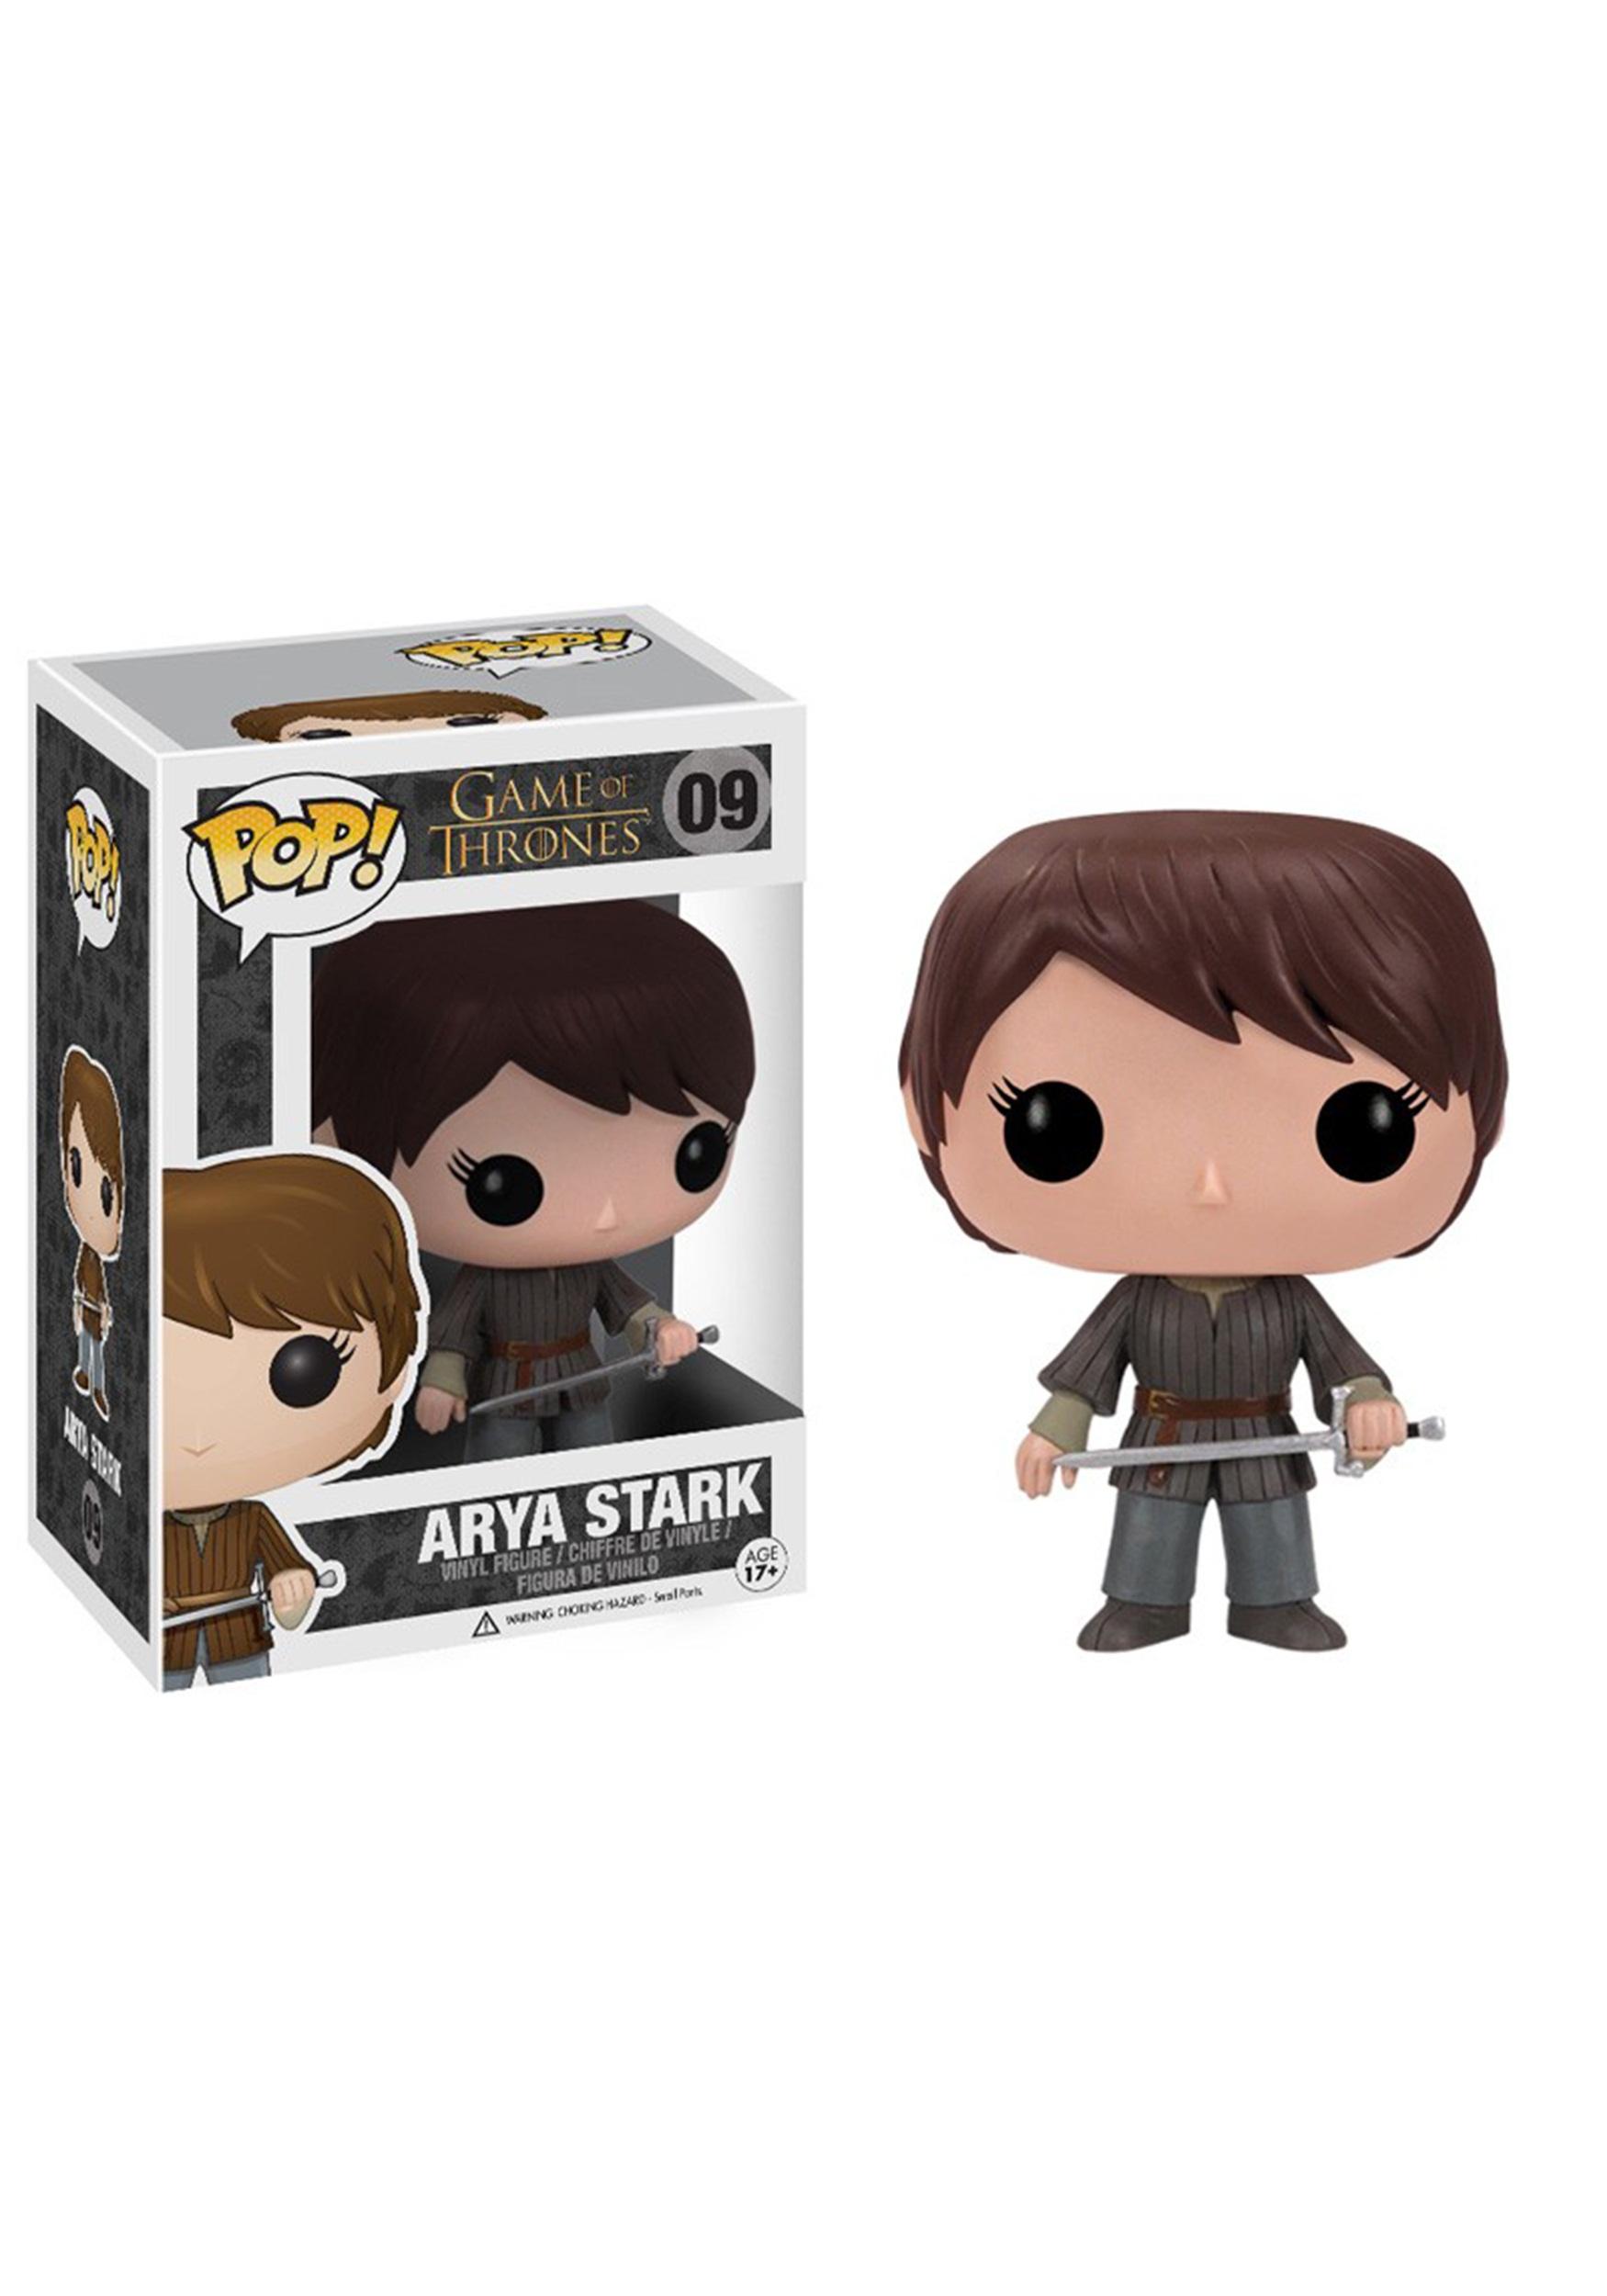 Game of Thrones Arya Stark Vinyl Figure POP!